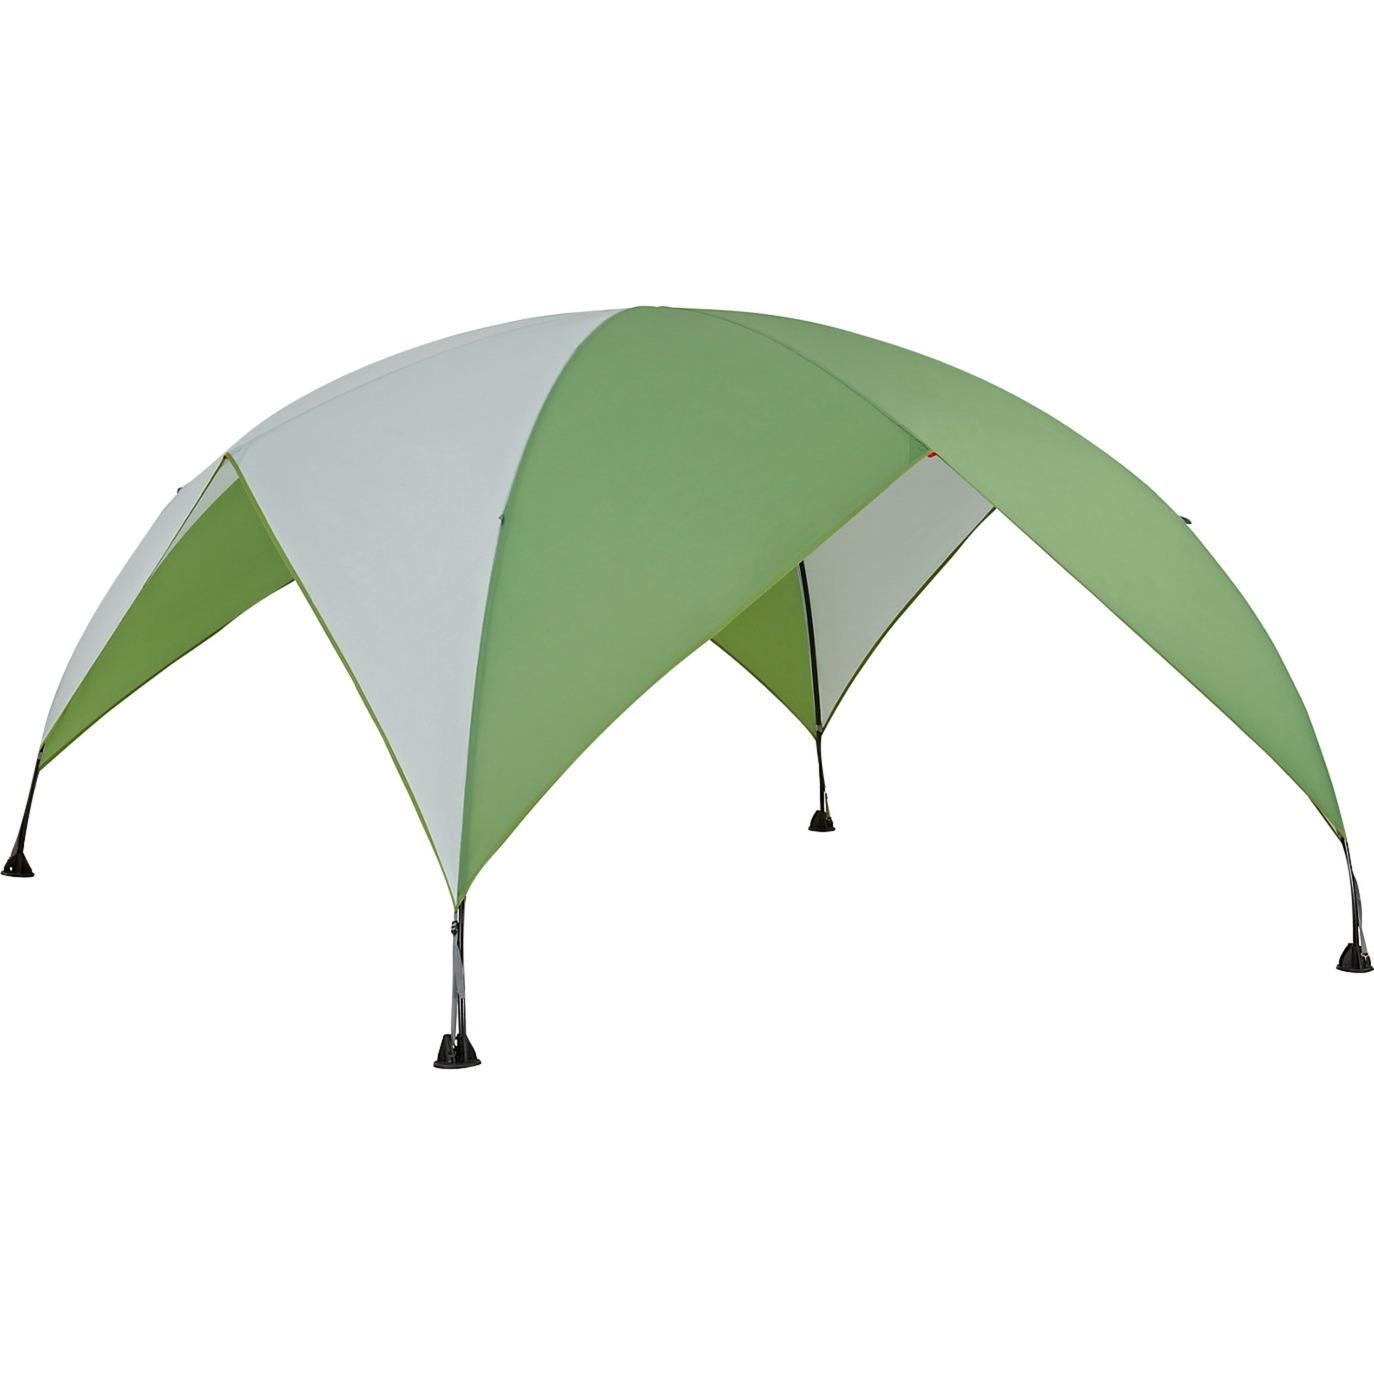 2000024842-gron-hvid-camping-canopy-shelter-pavilion